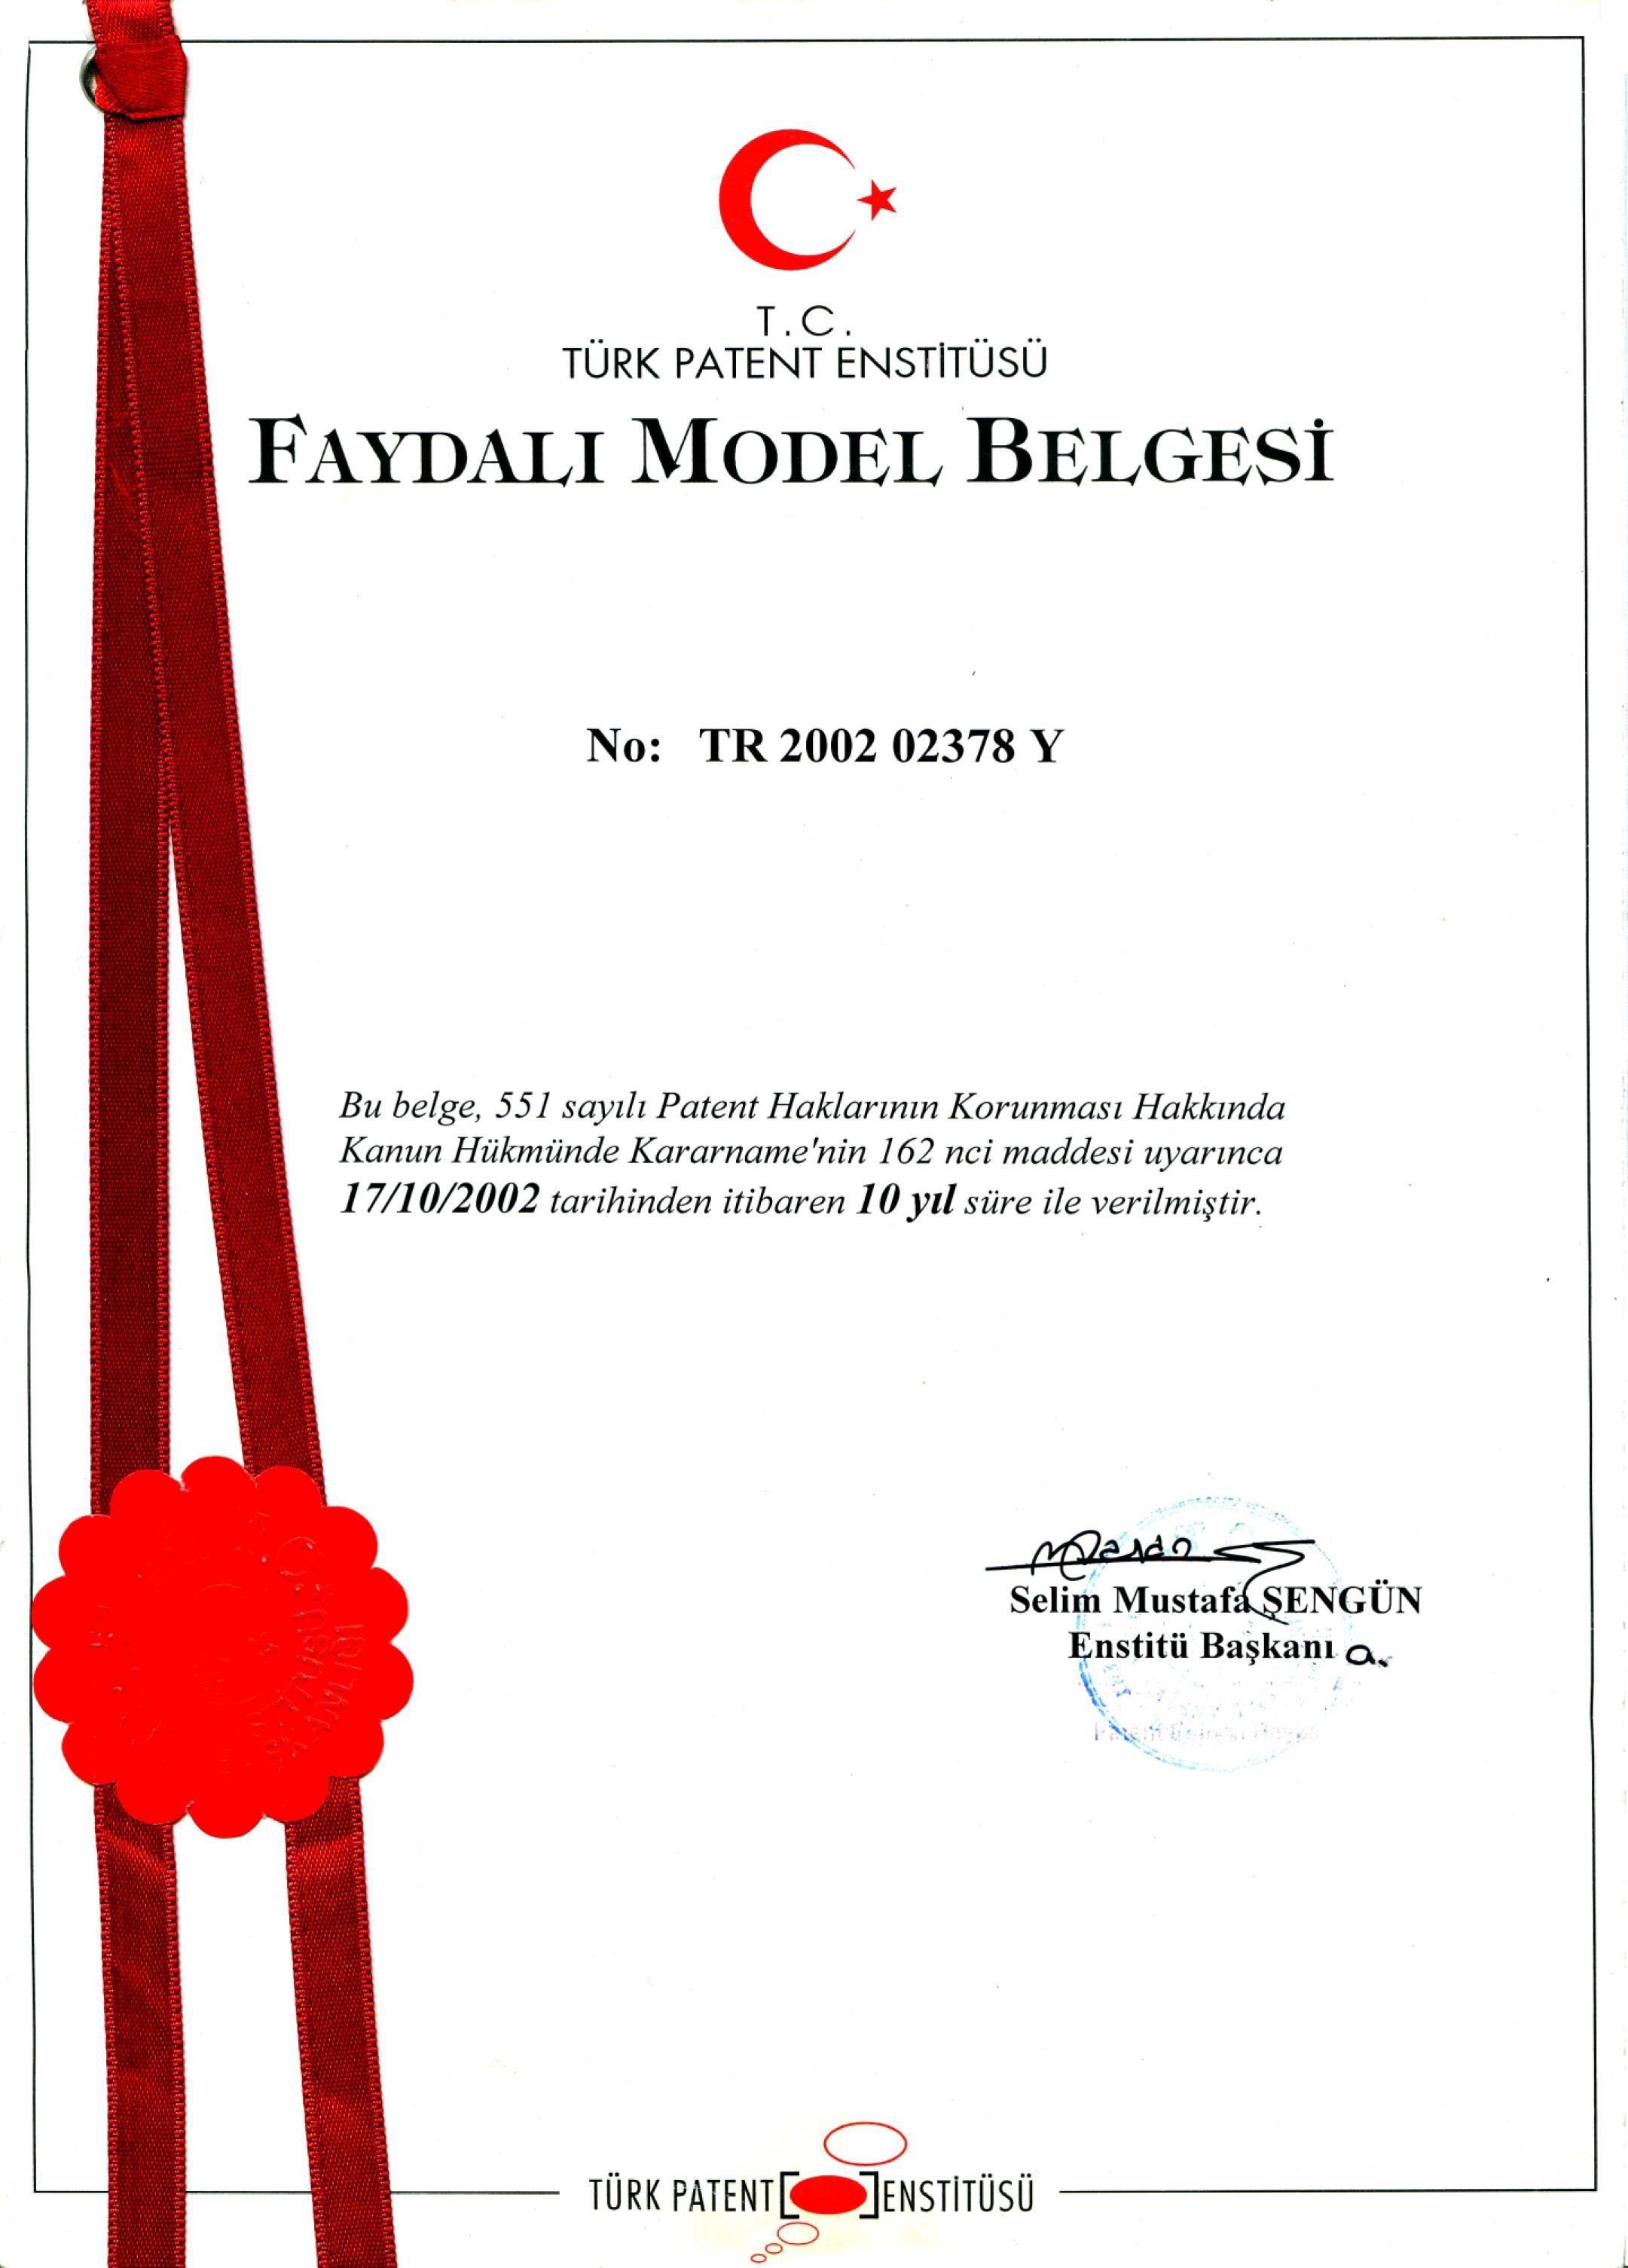 Nützliches Modelldokument